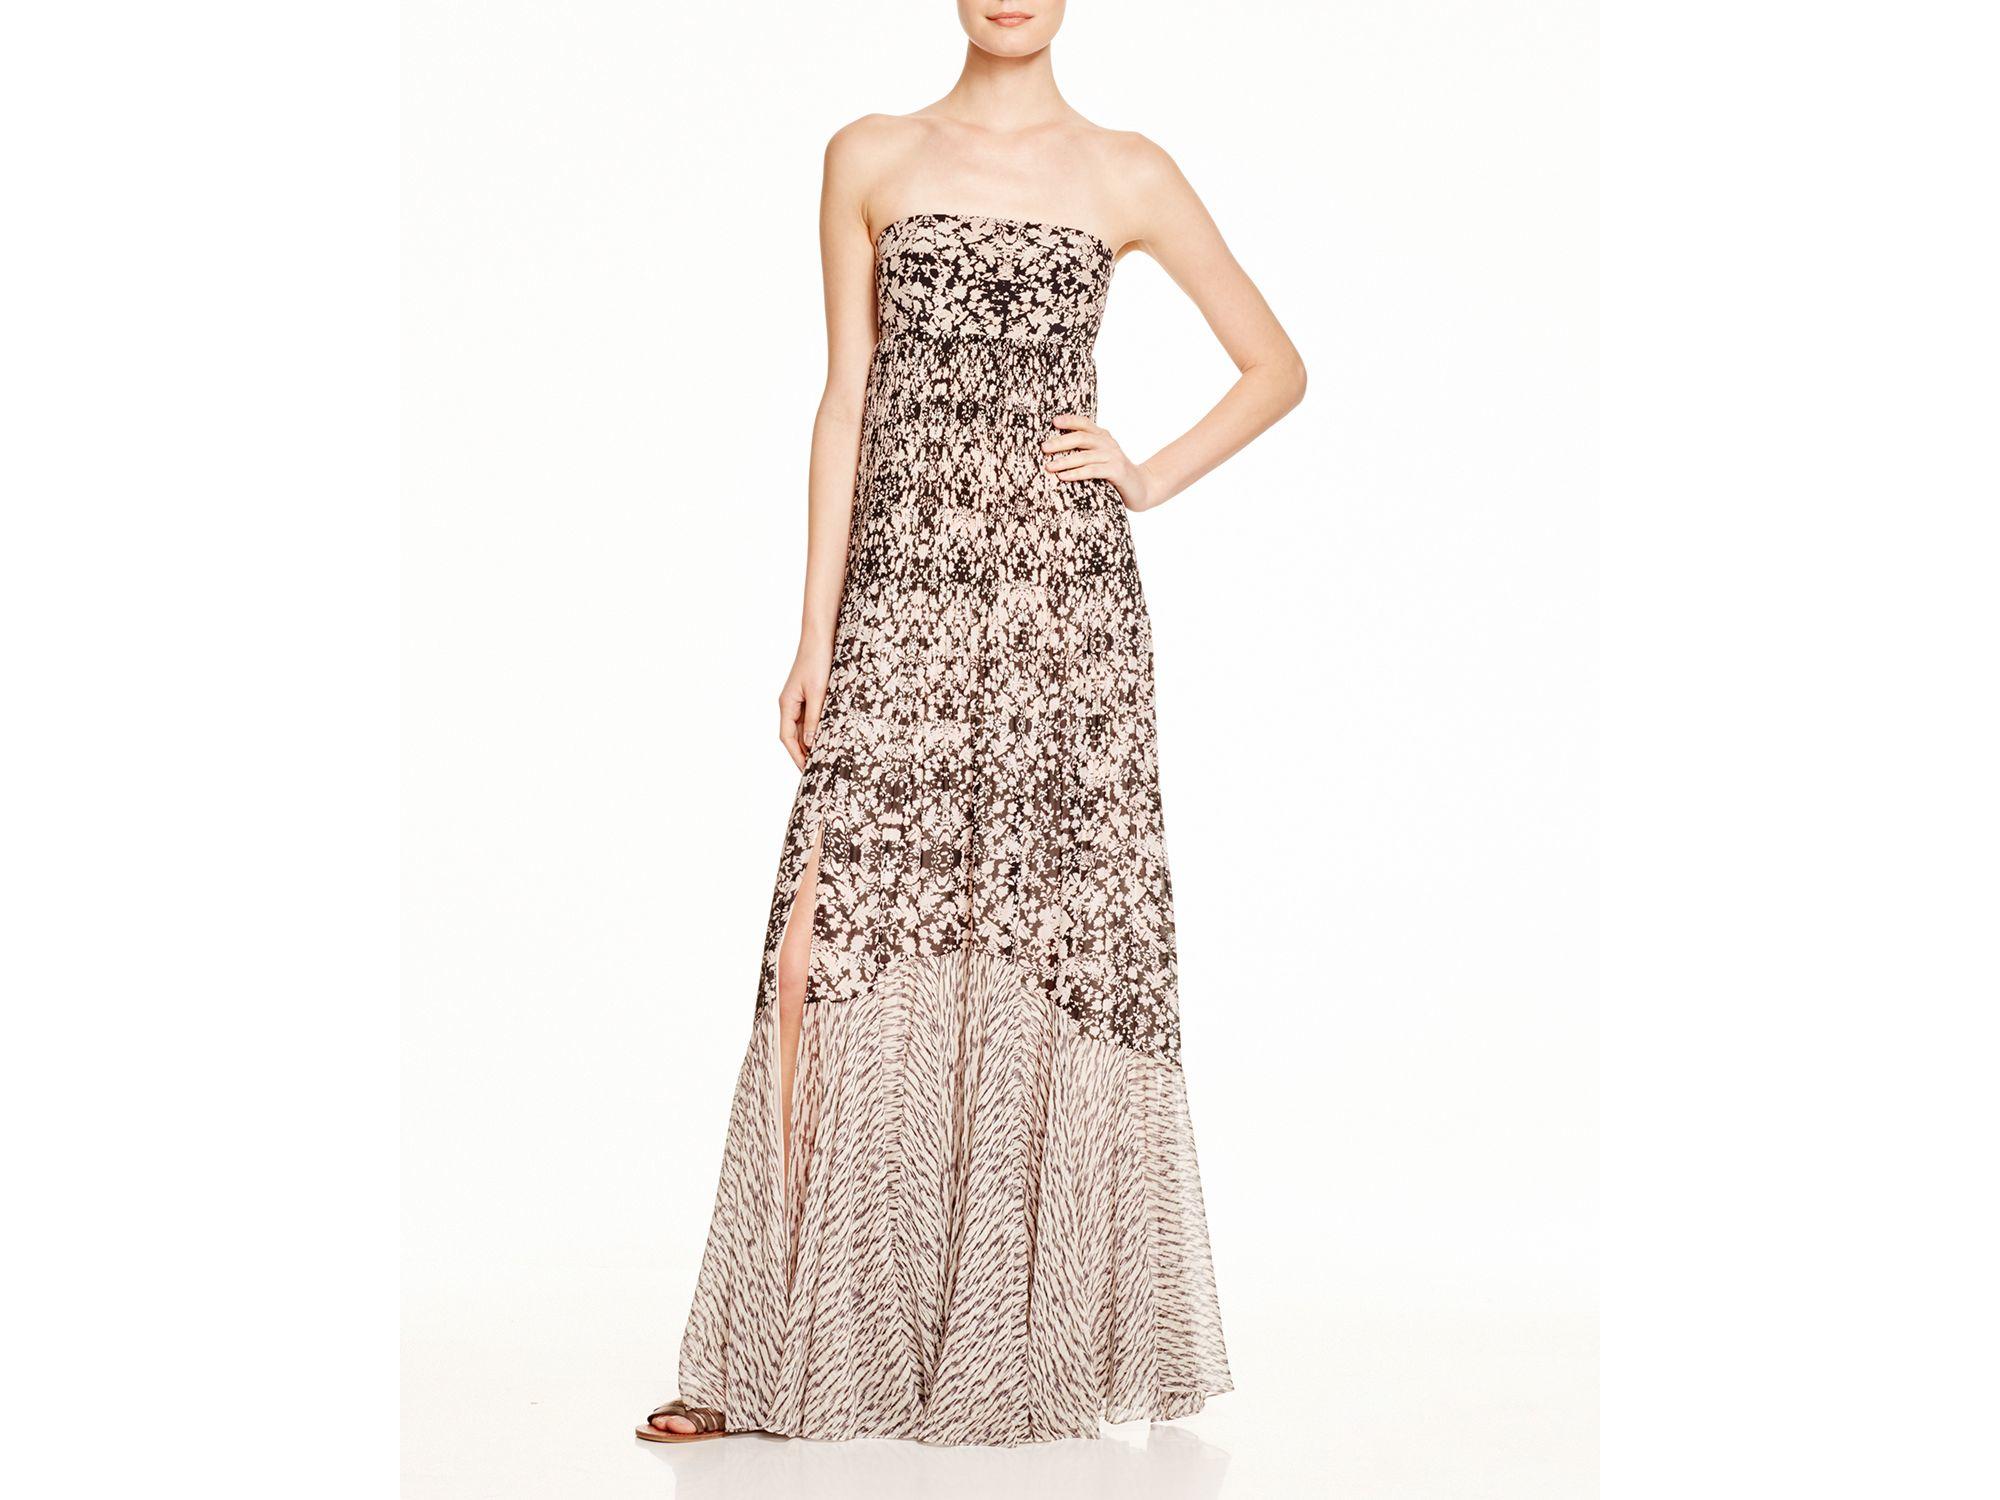 Lyst - Rebecca Taylor Printed Strapless Maxi Dress